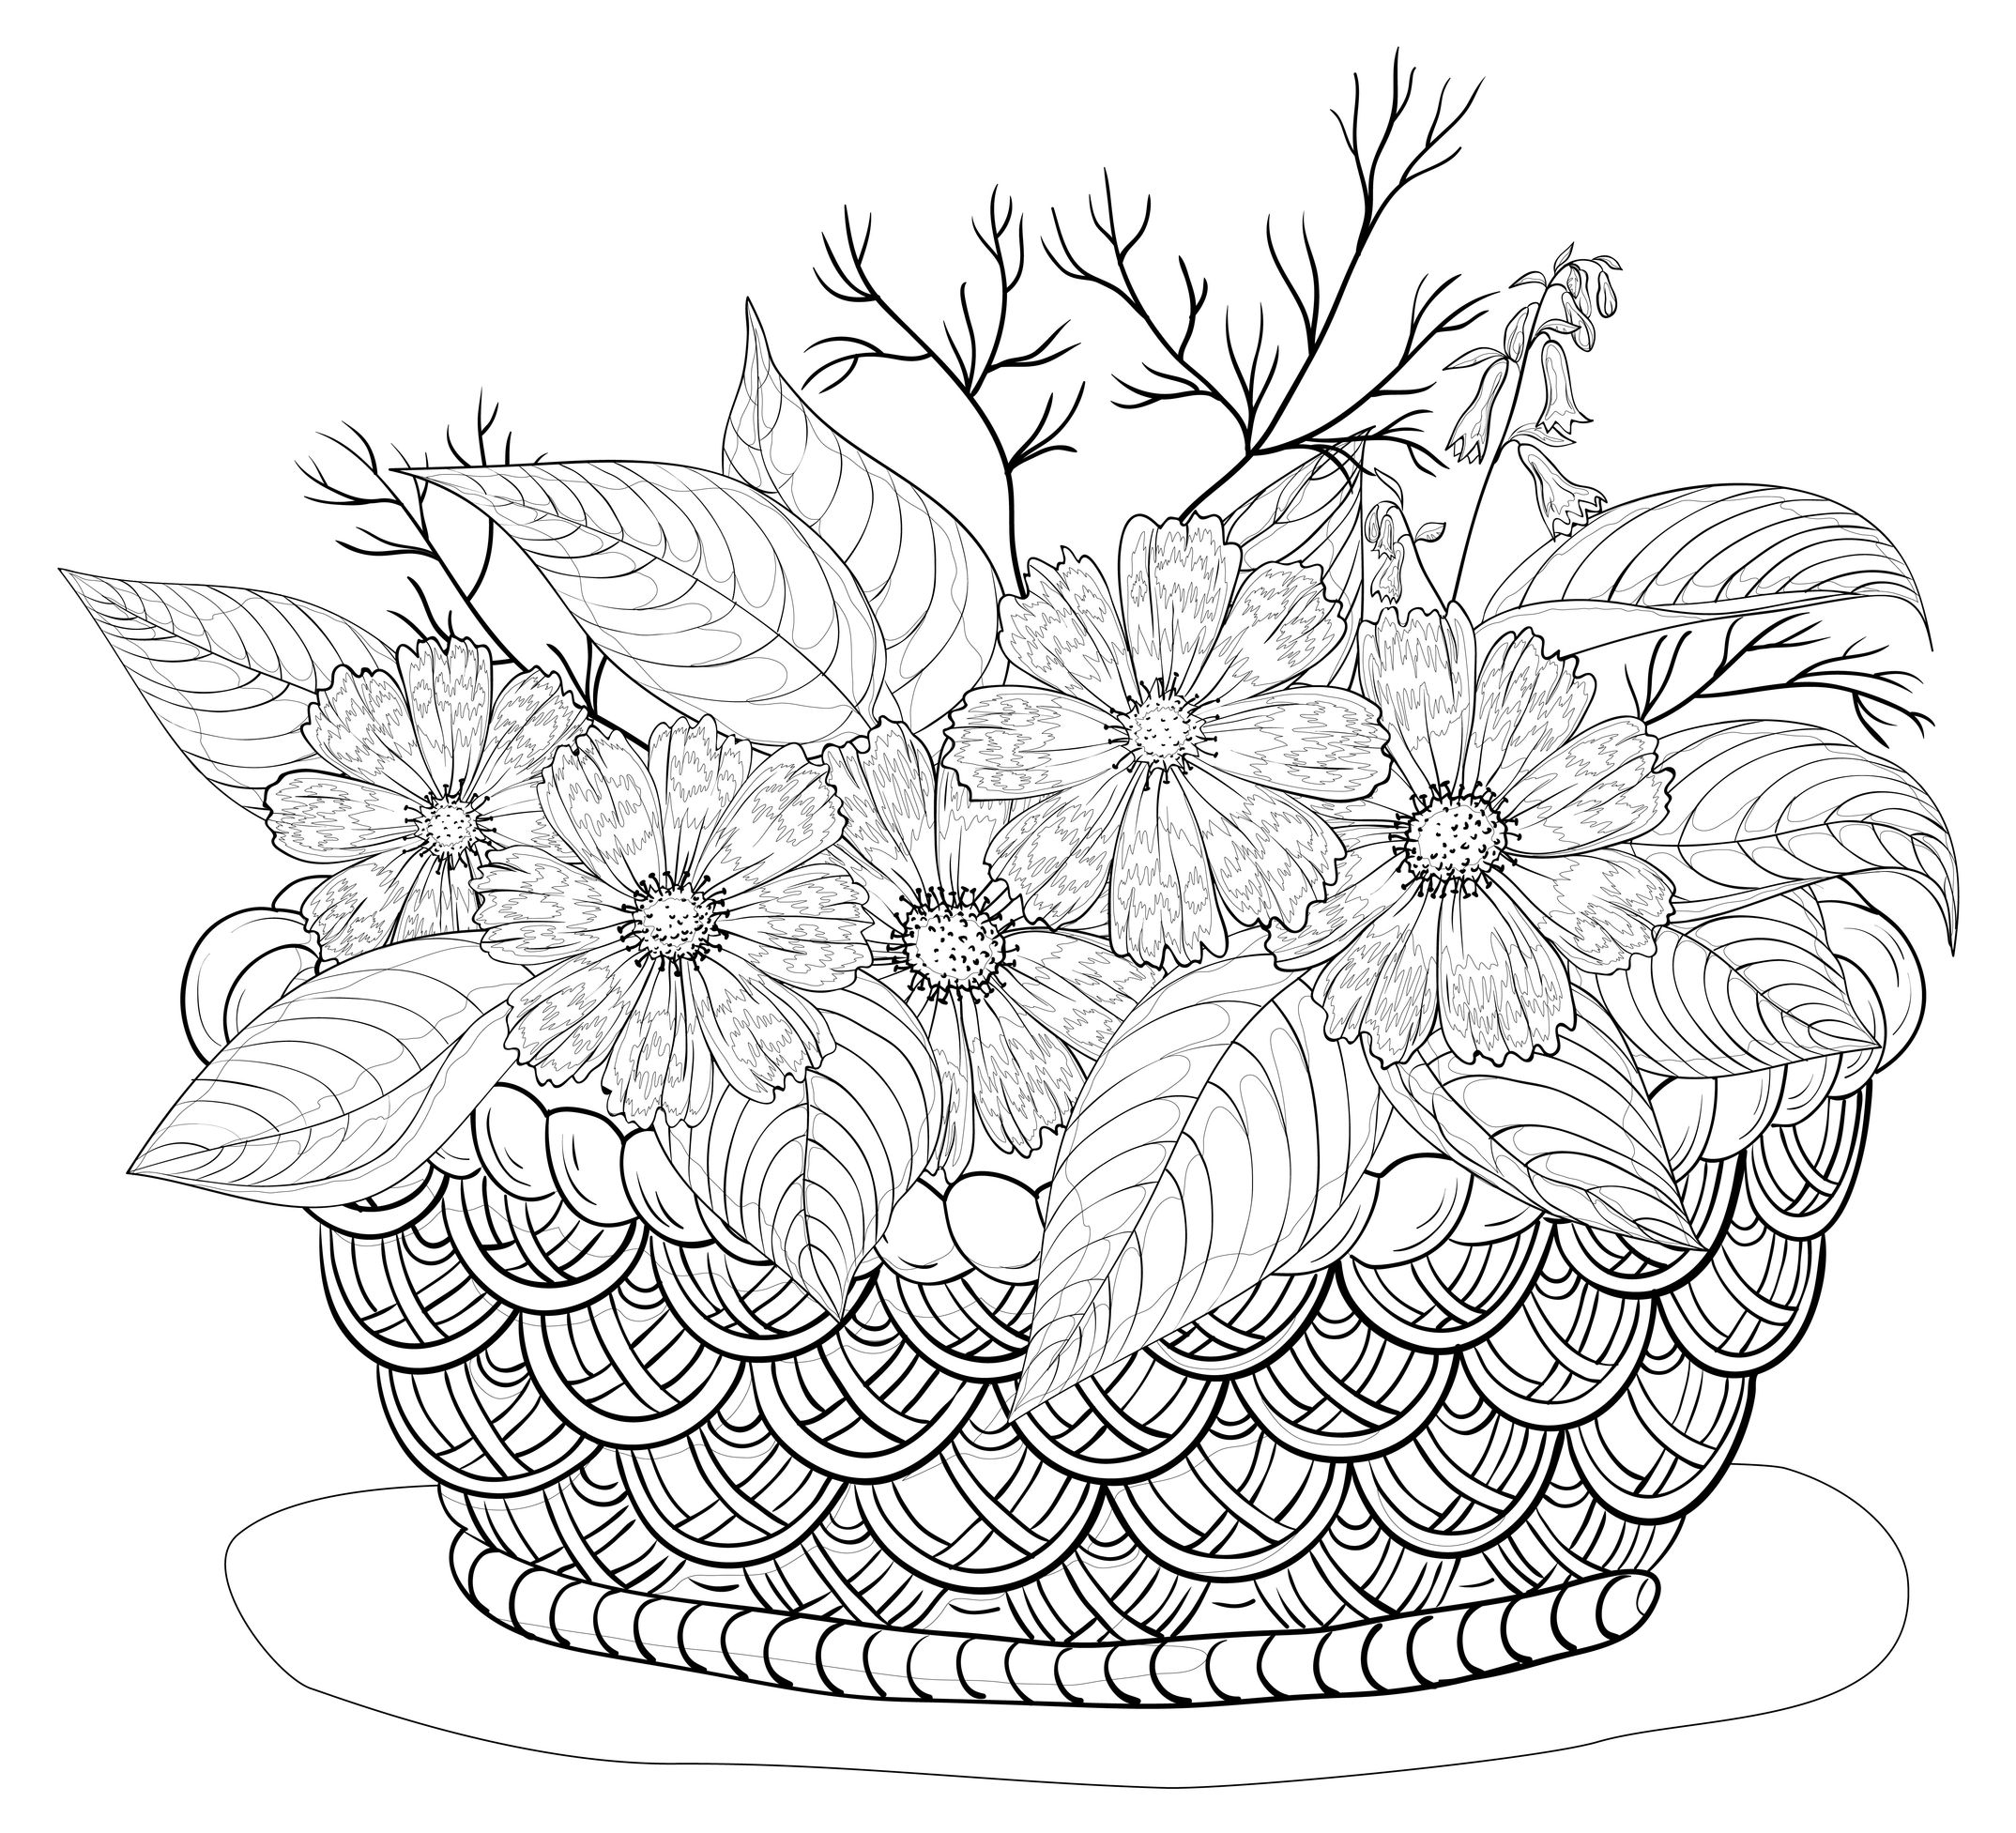 91 dessins de coloriage papillon adulte imprimer. Black Bedroom Furniture Sets. Home Design Ideas